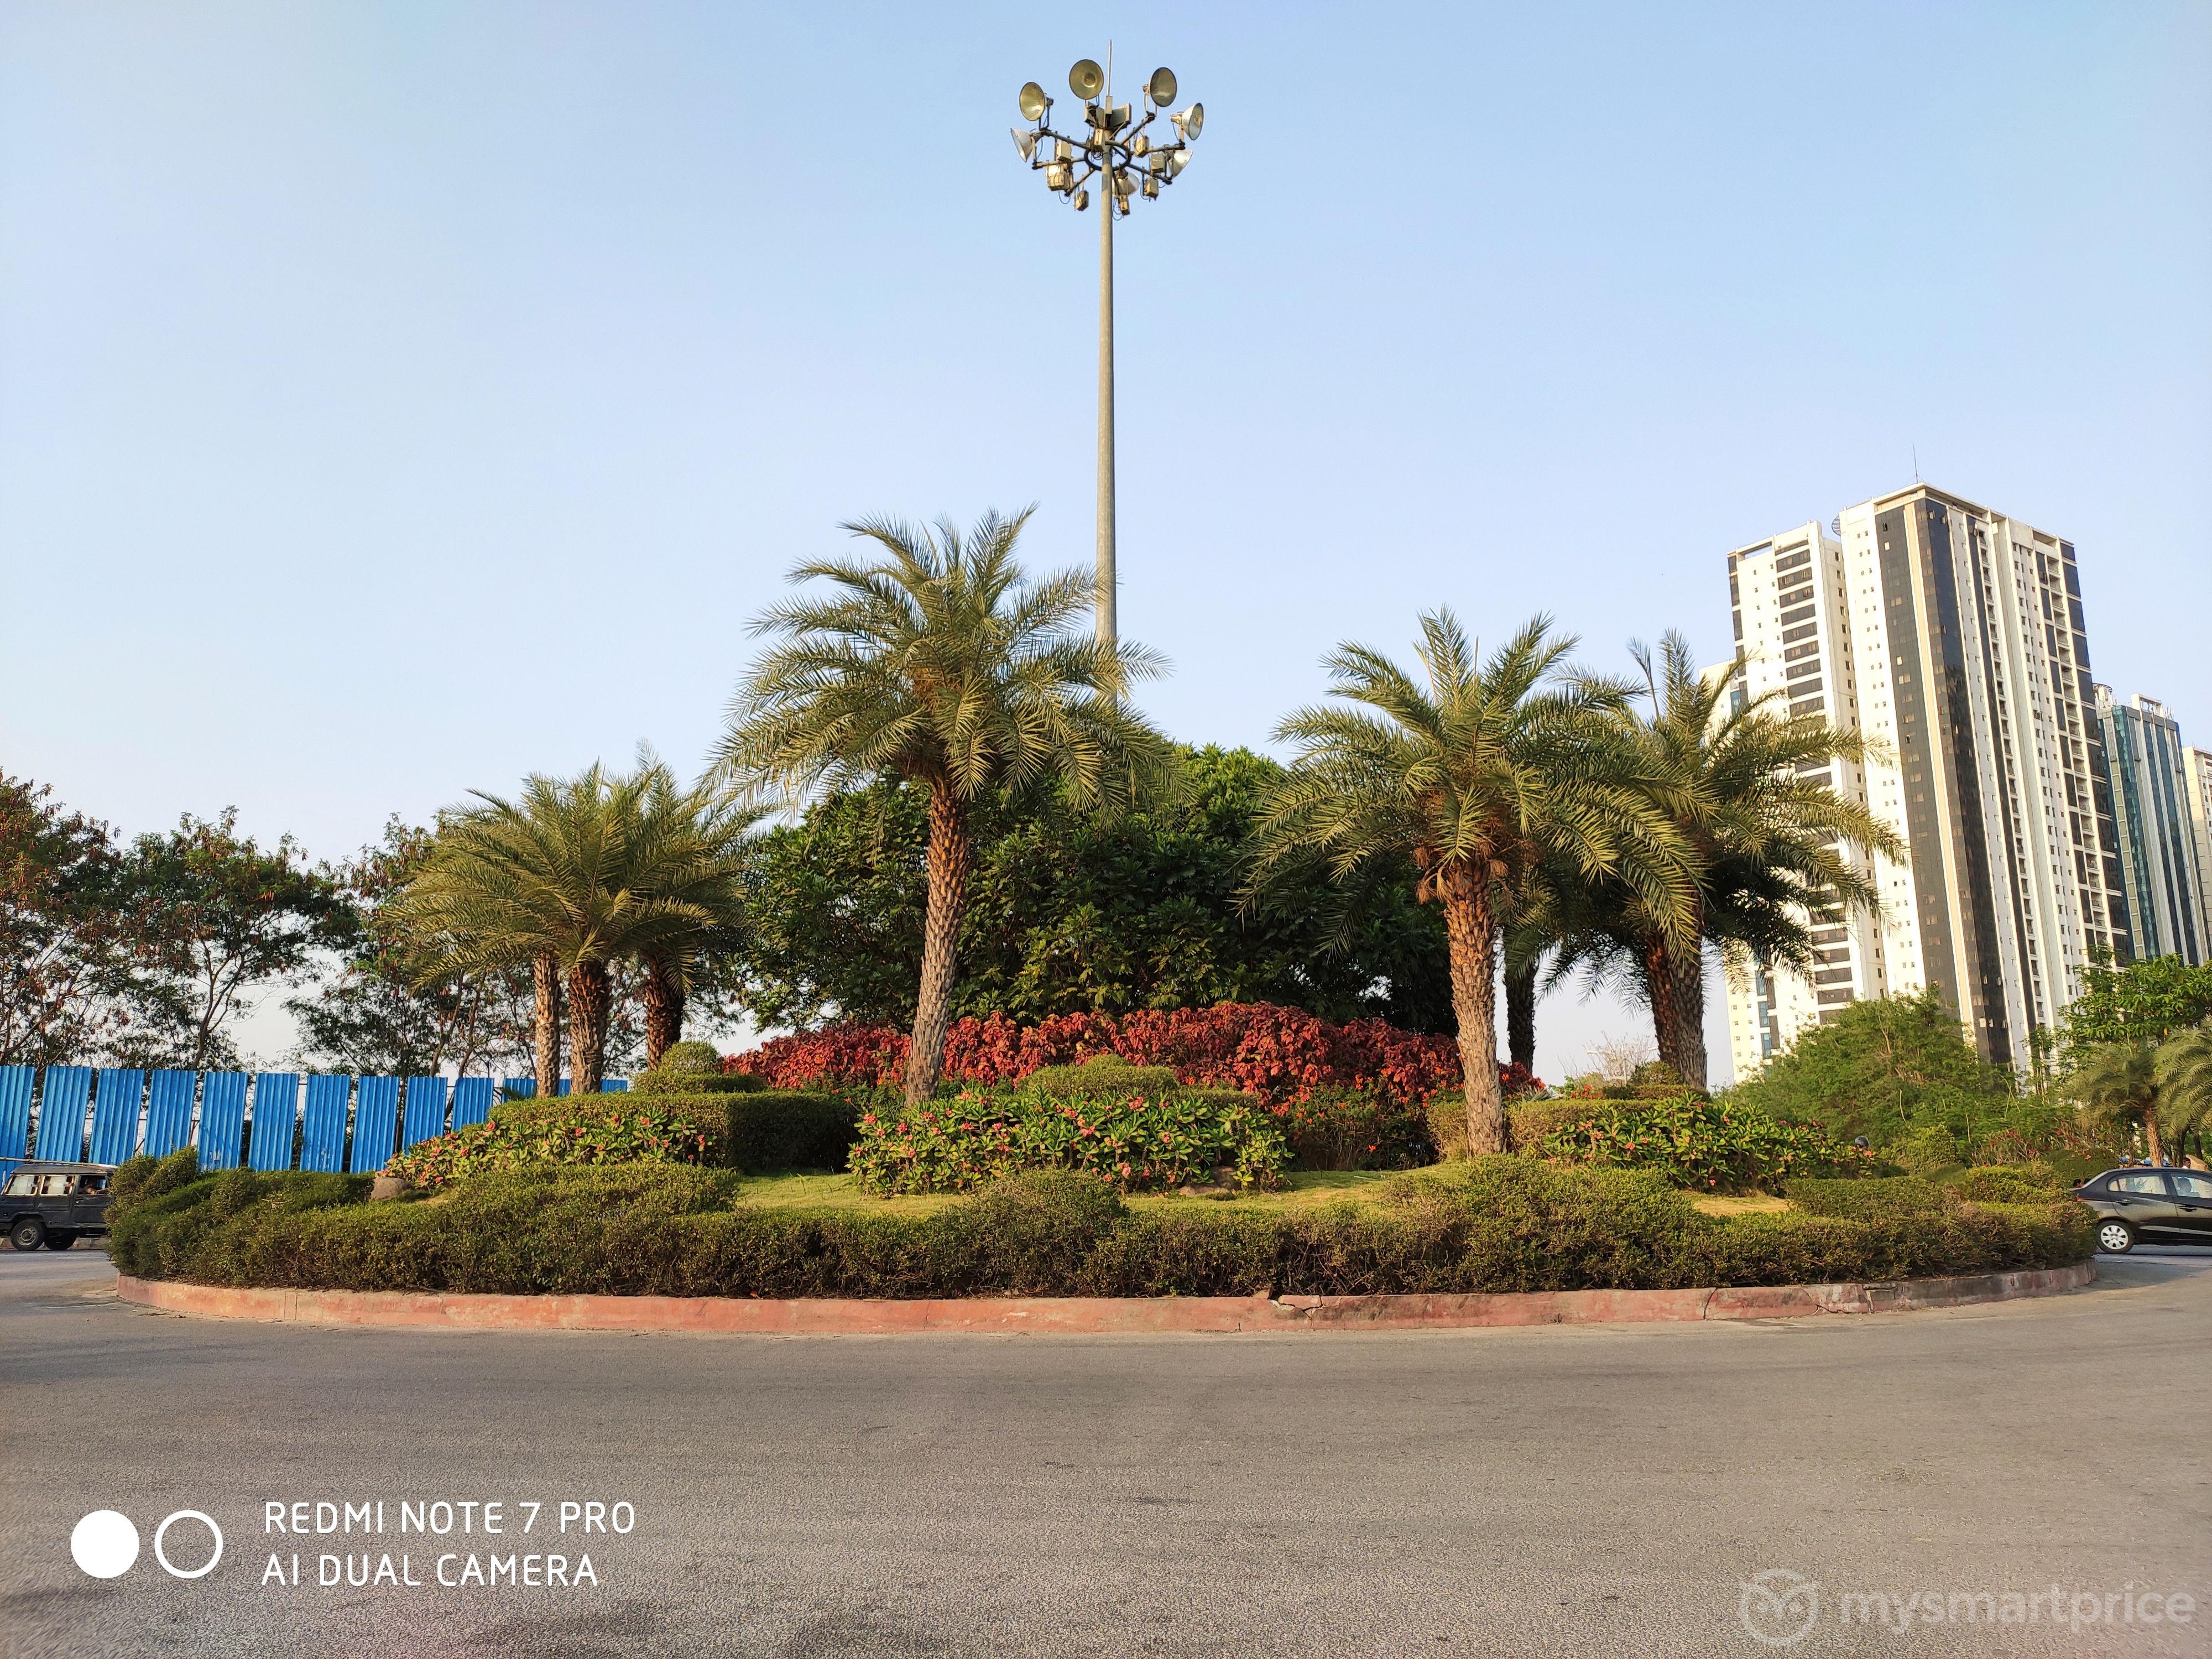 Xiaomi Redmi Note 7 Pro Daylight Camera Sample 02